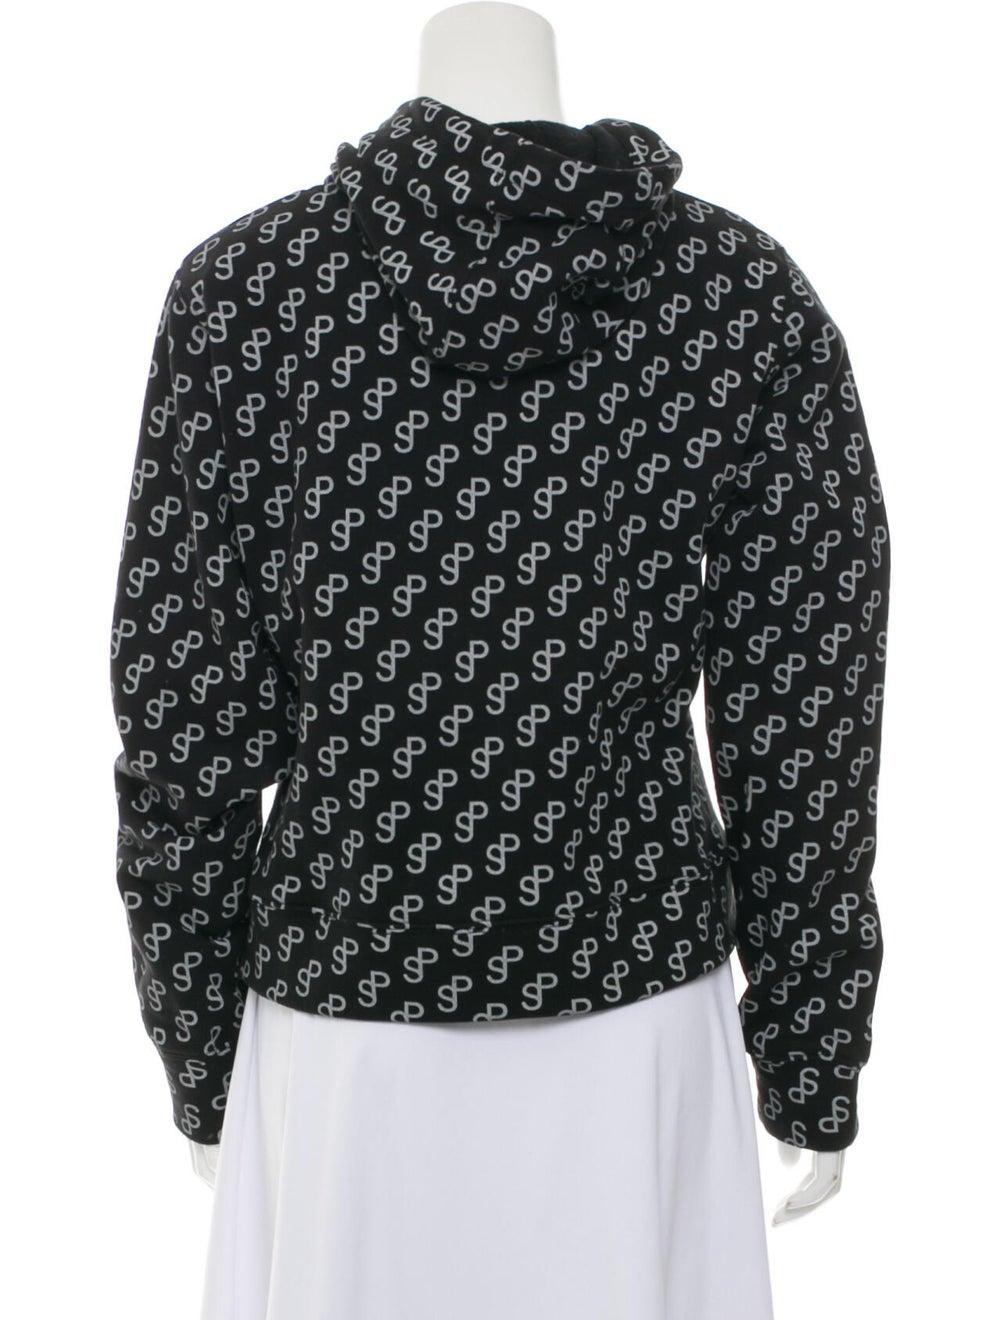 Saks Potts Printed Crew Neck Sweater Black - image 3